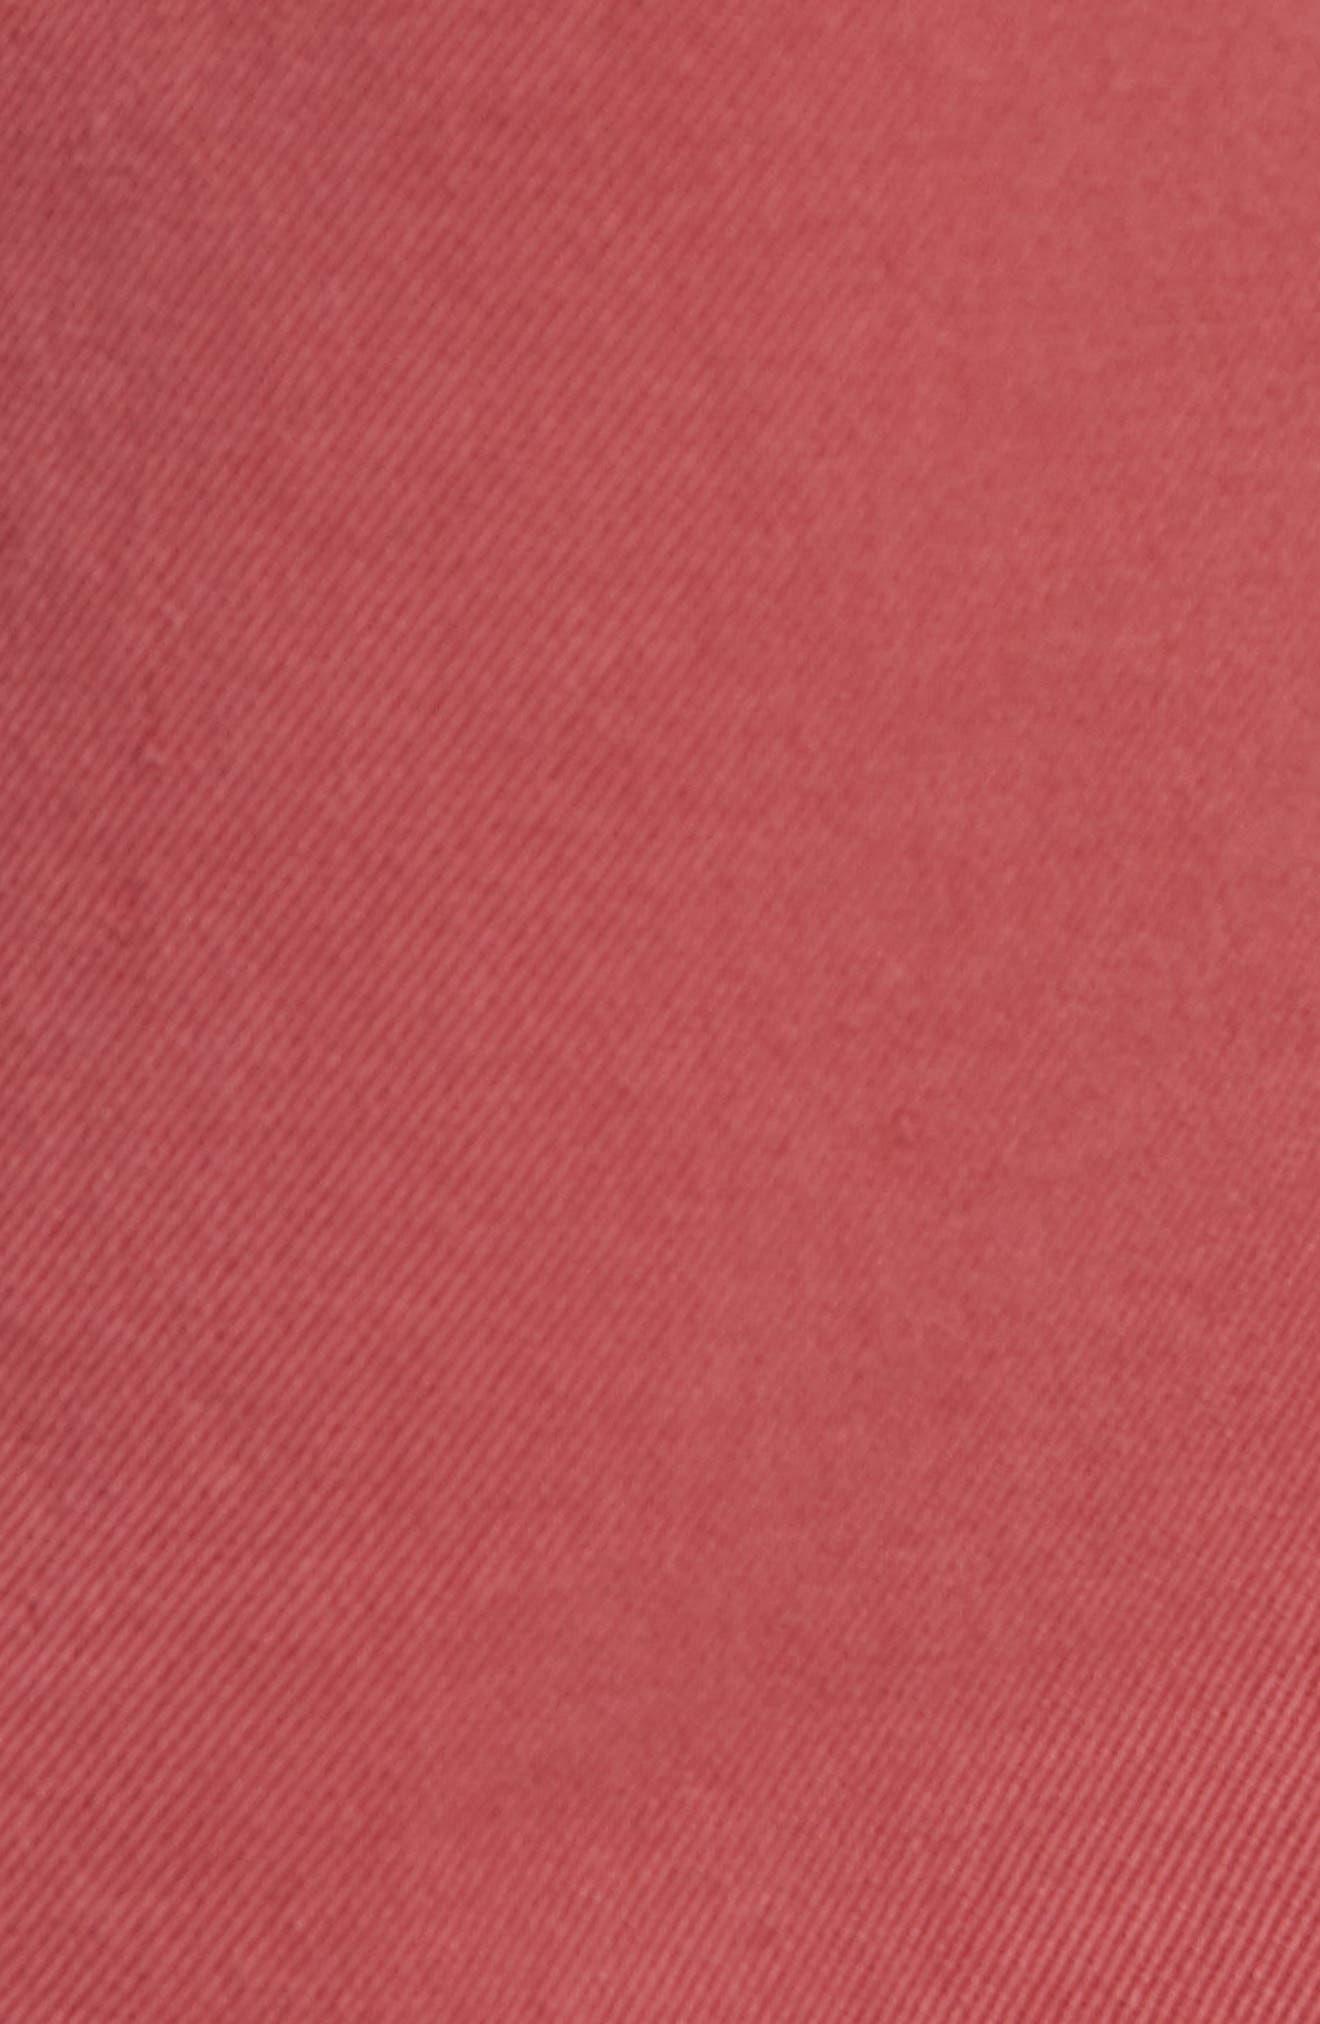 RAG & BONE,                             Fit 2 Slim Fit Chinos,                             Alternate thumbnail 5, color,                             ELLIS RED